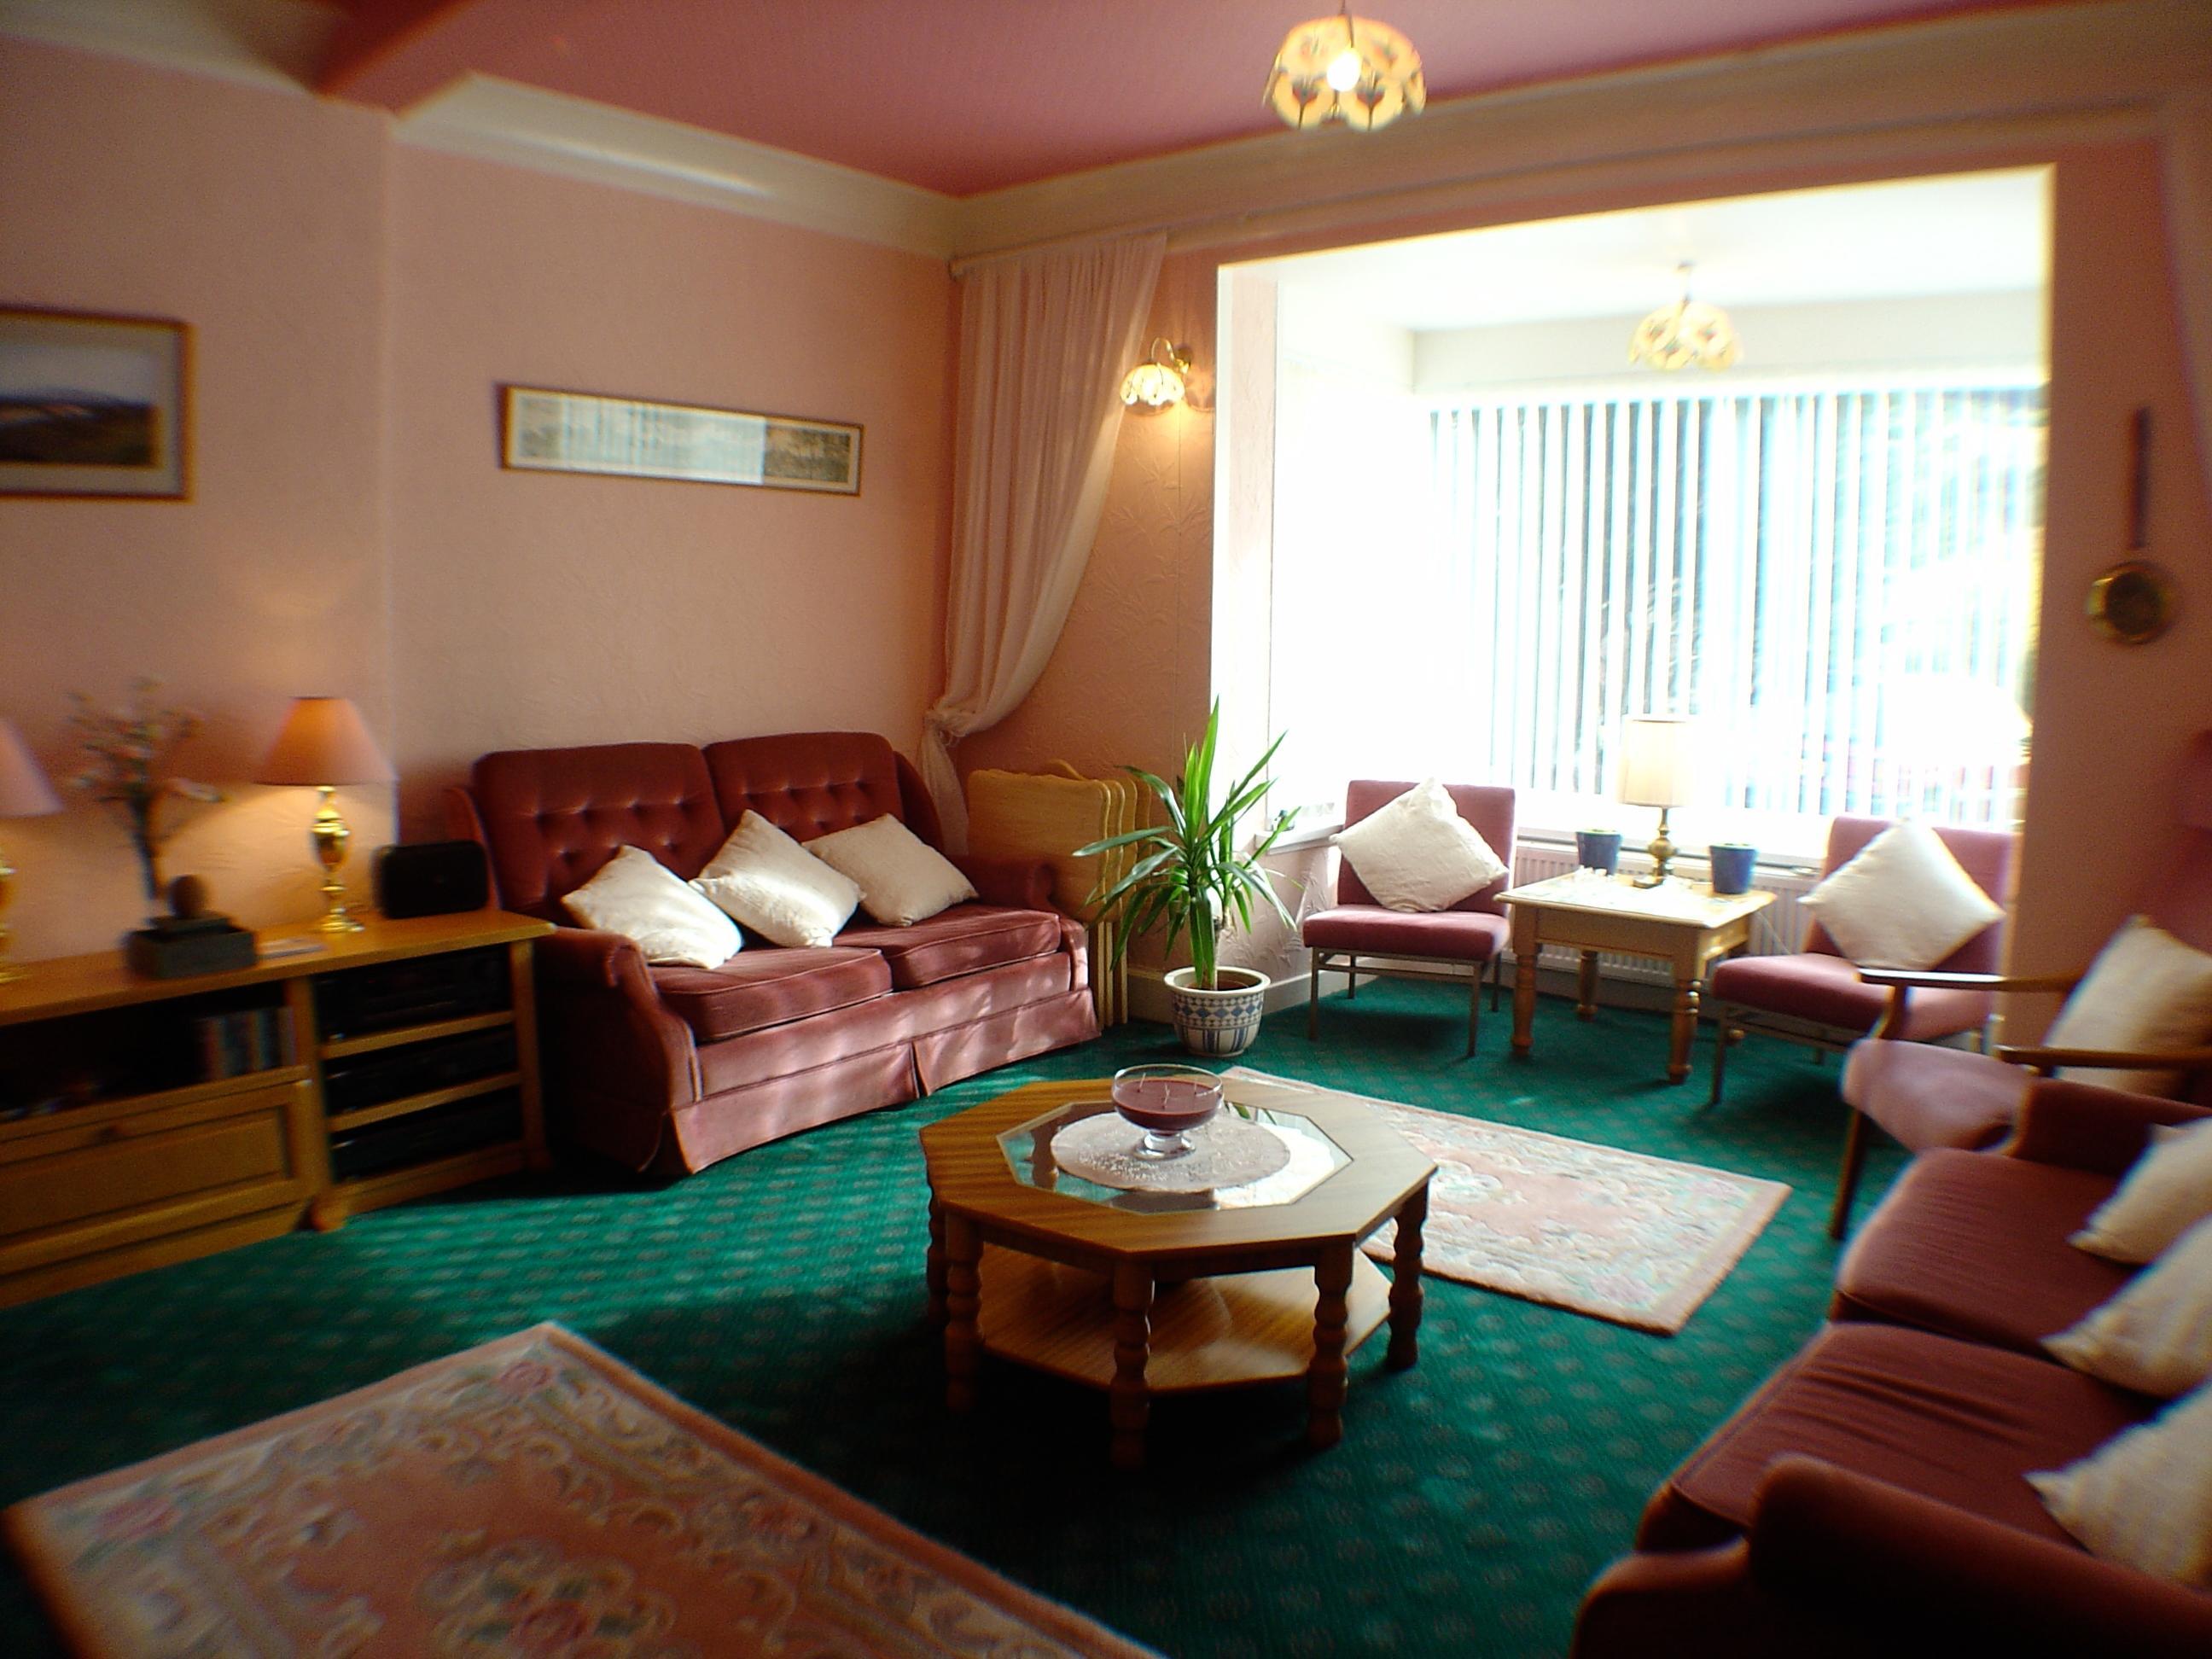 Allandale house hotels in brodick ka27 8bj for Allandale house